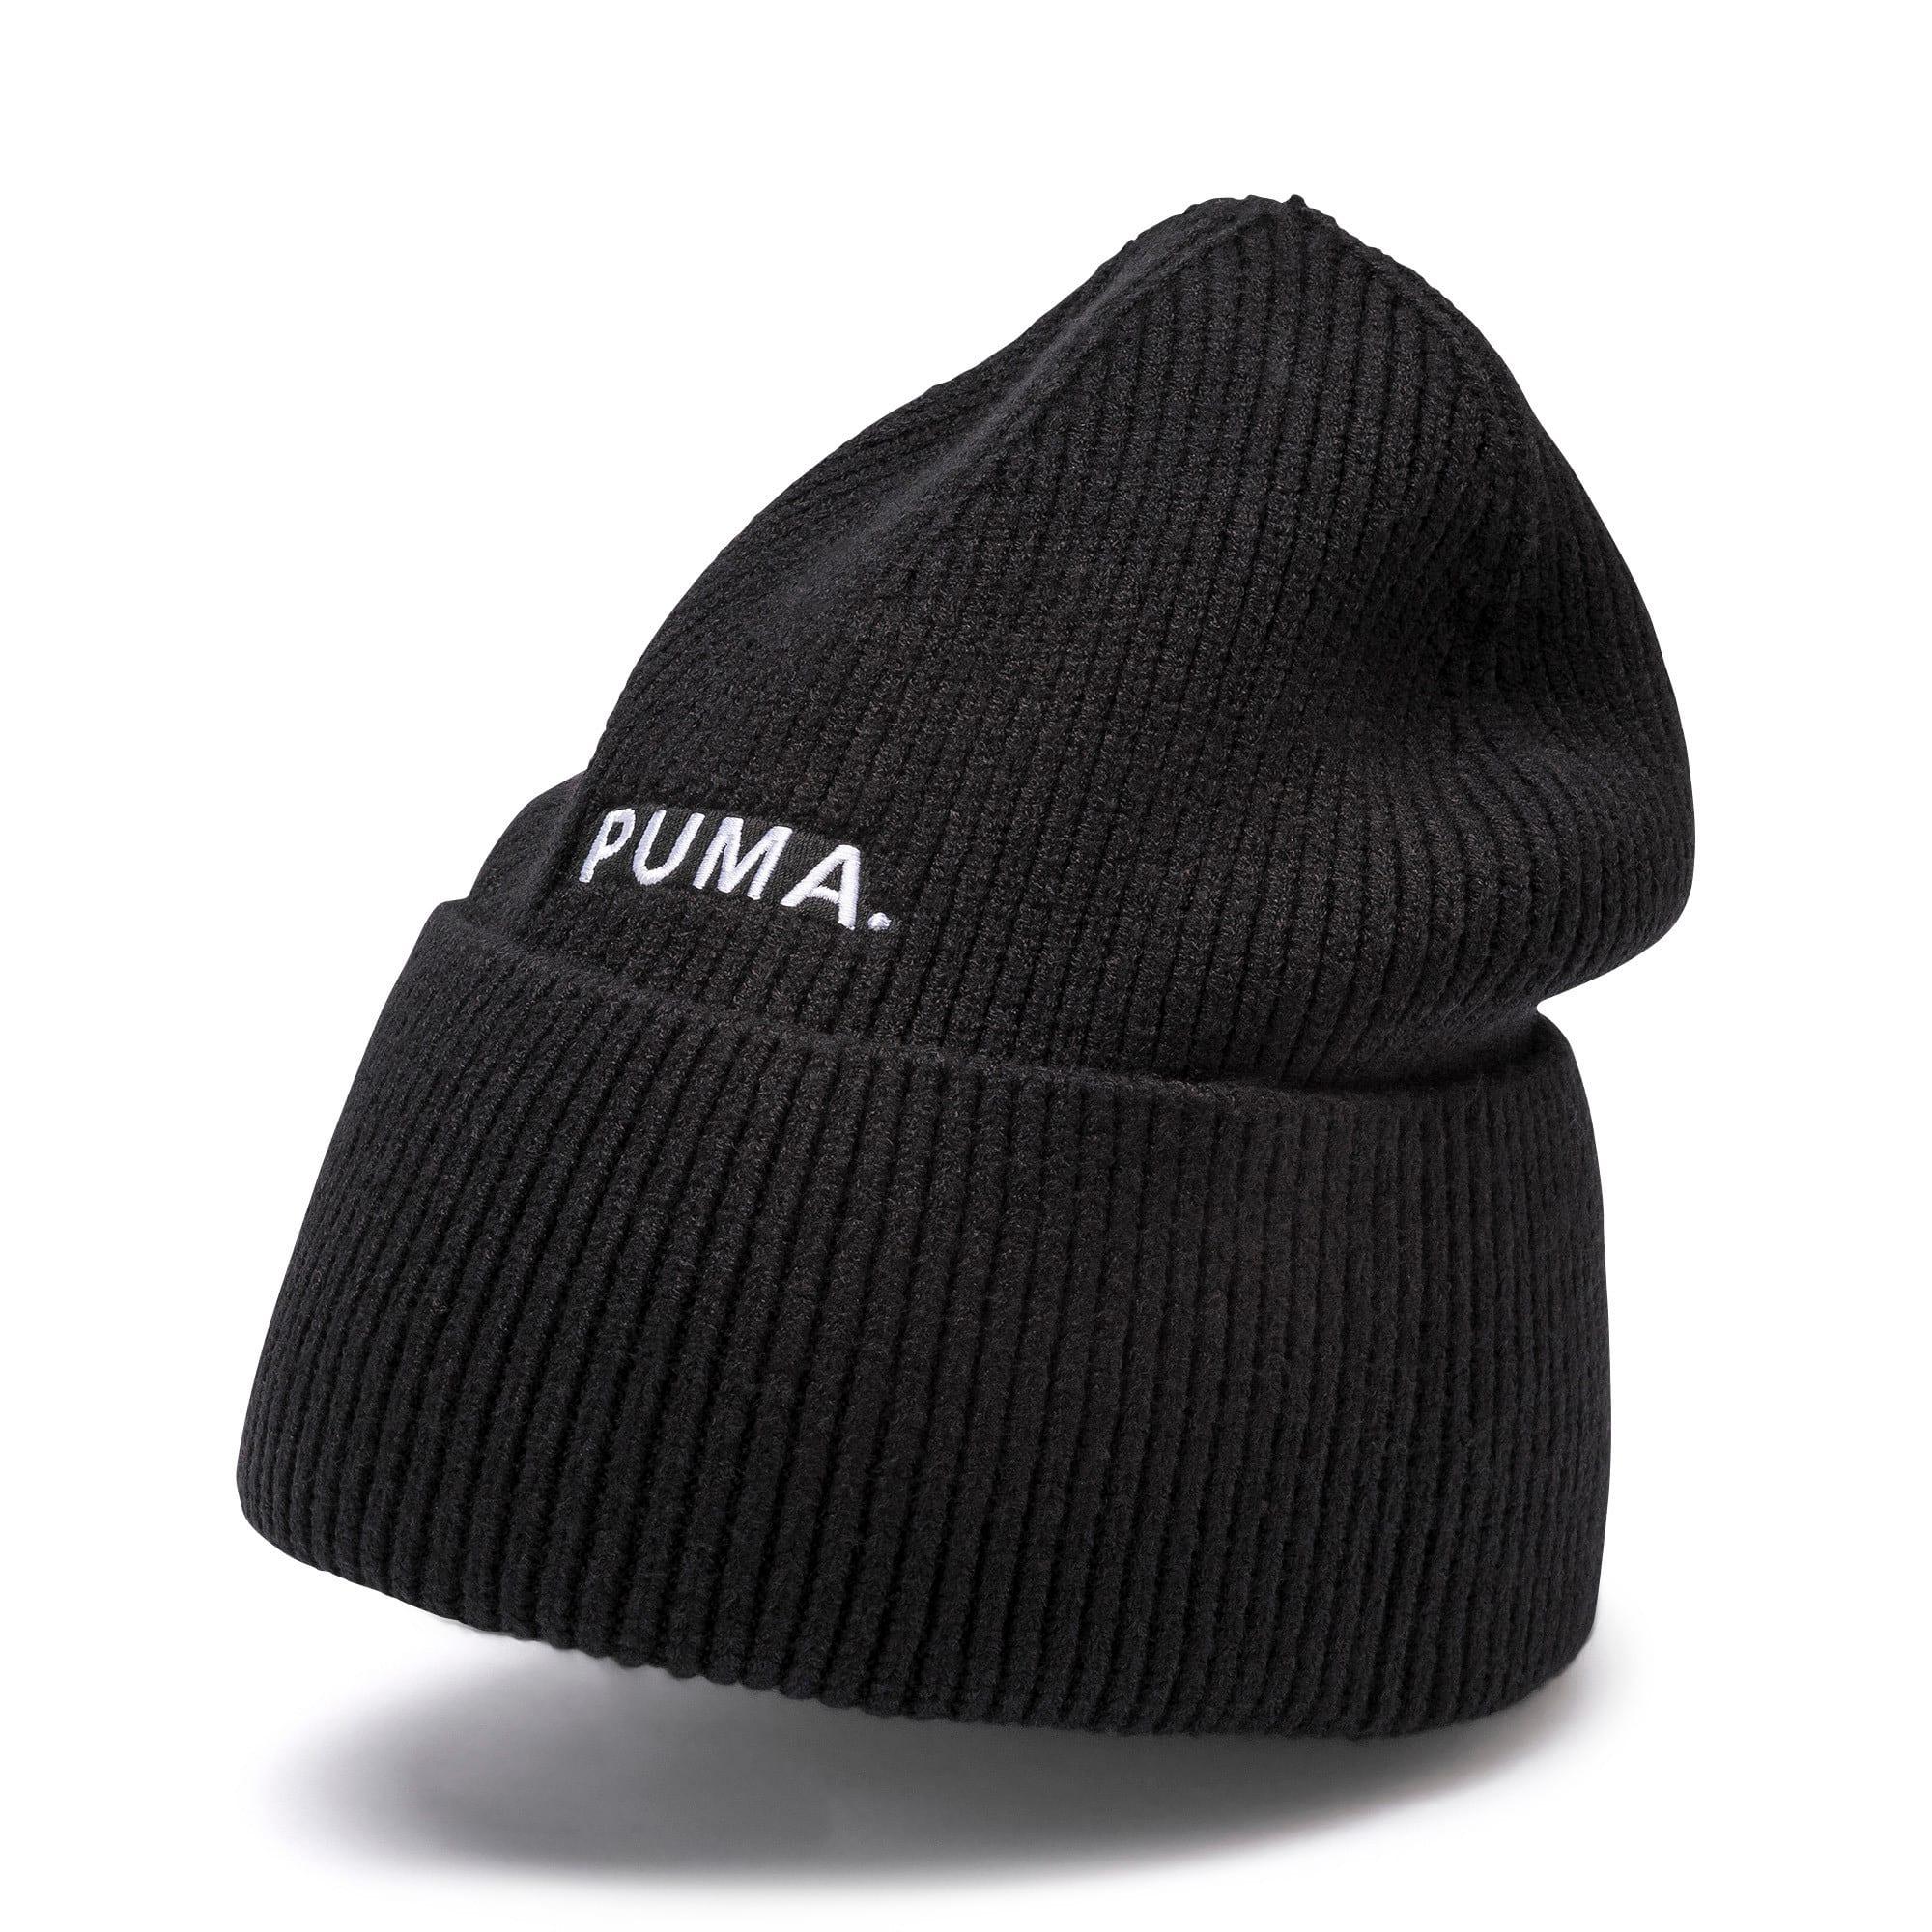 Thumbnail 1 of ハイブリッド フィット ウィメンズ トレンド ビーニー, Puma Black, medium-JPN